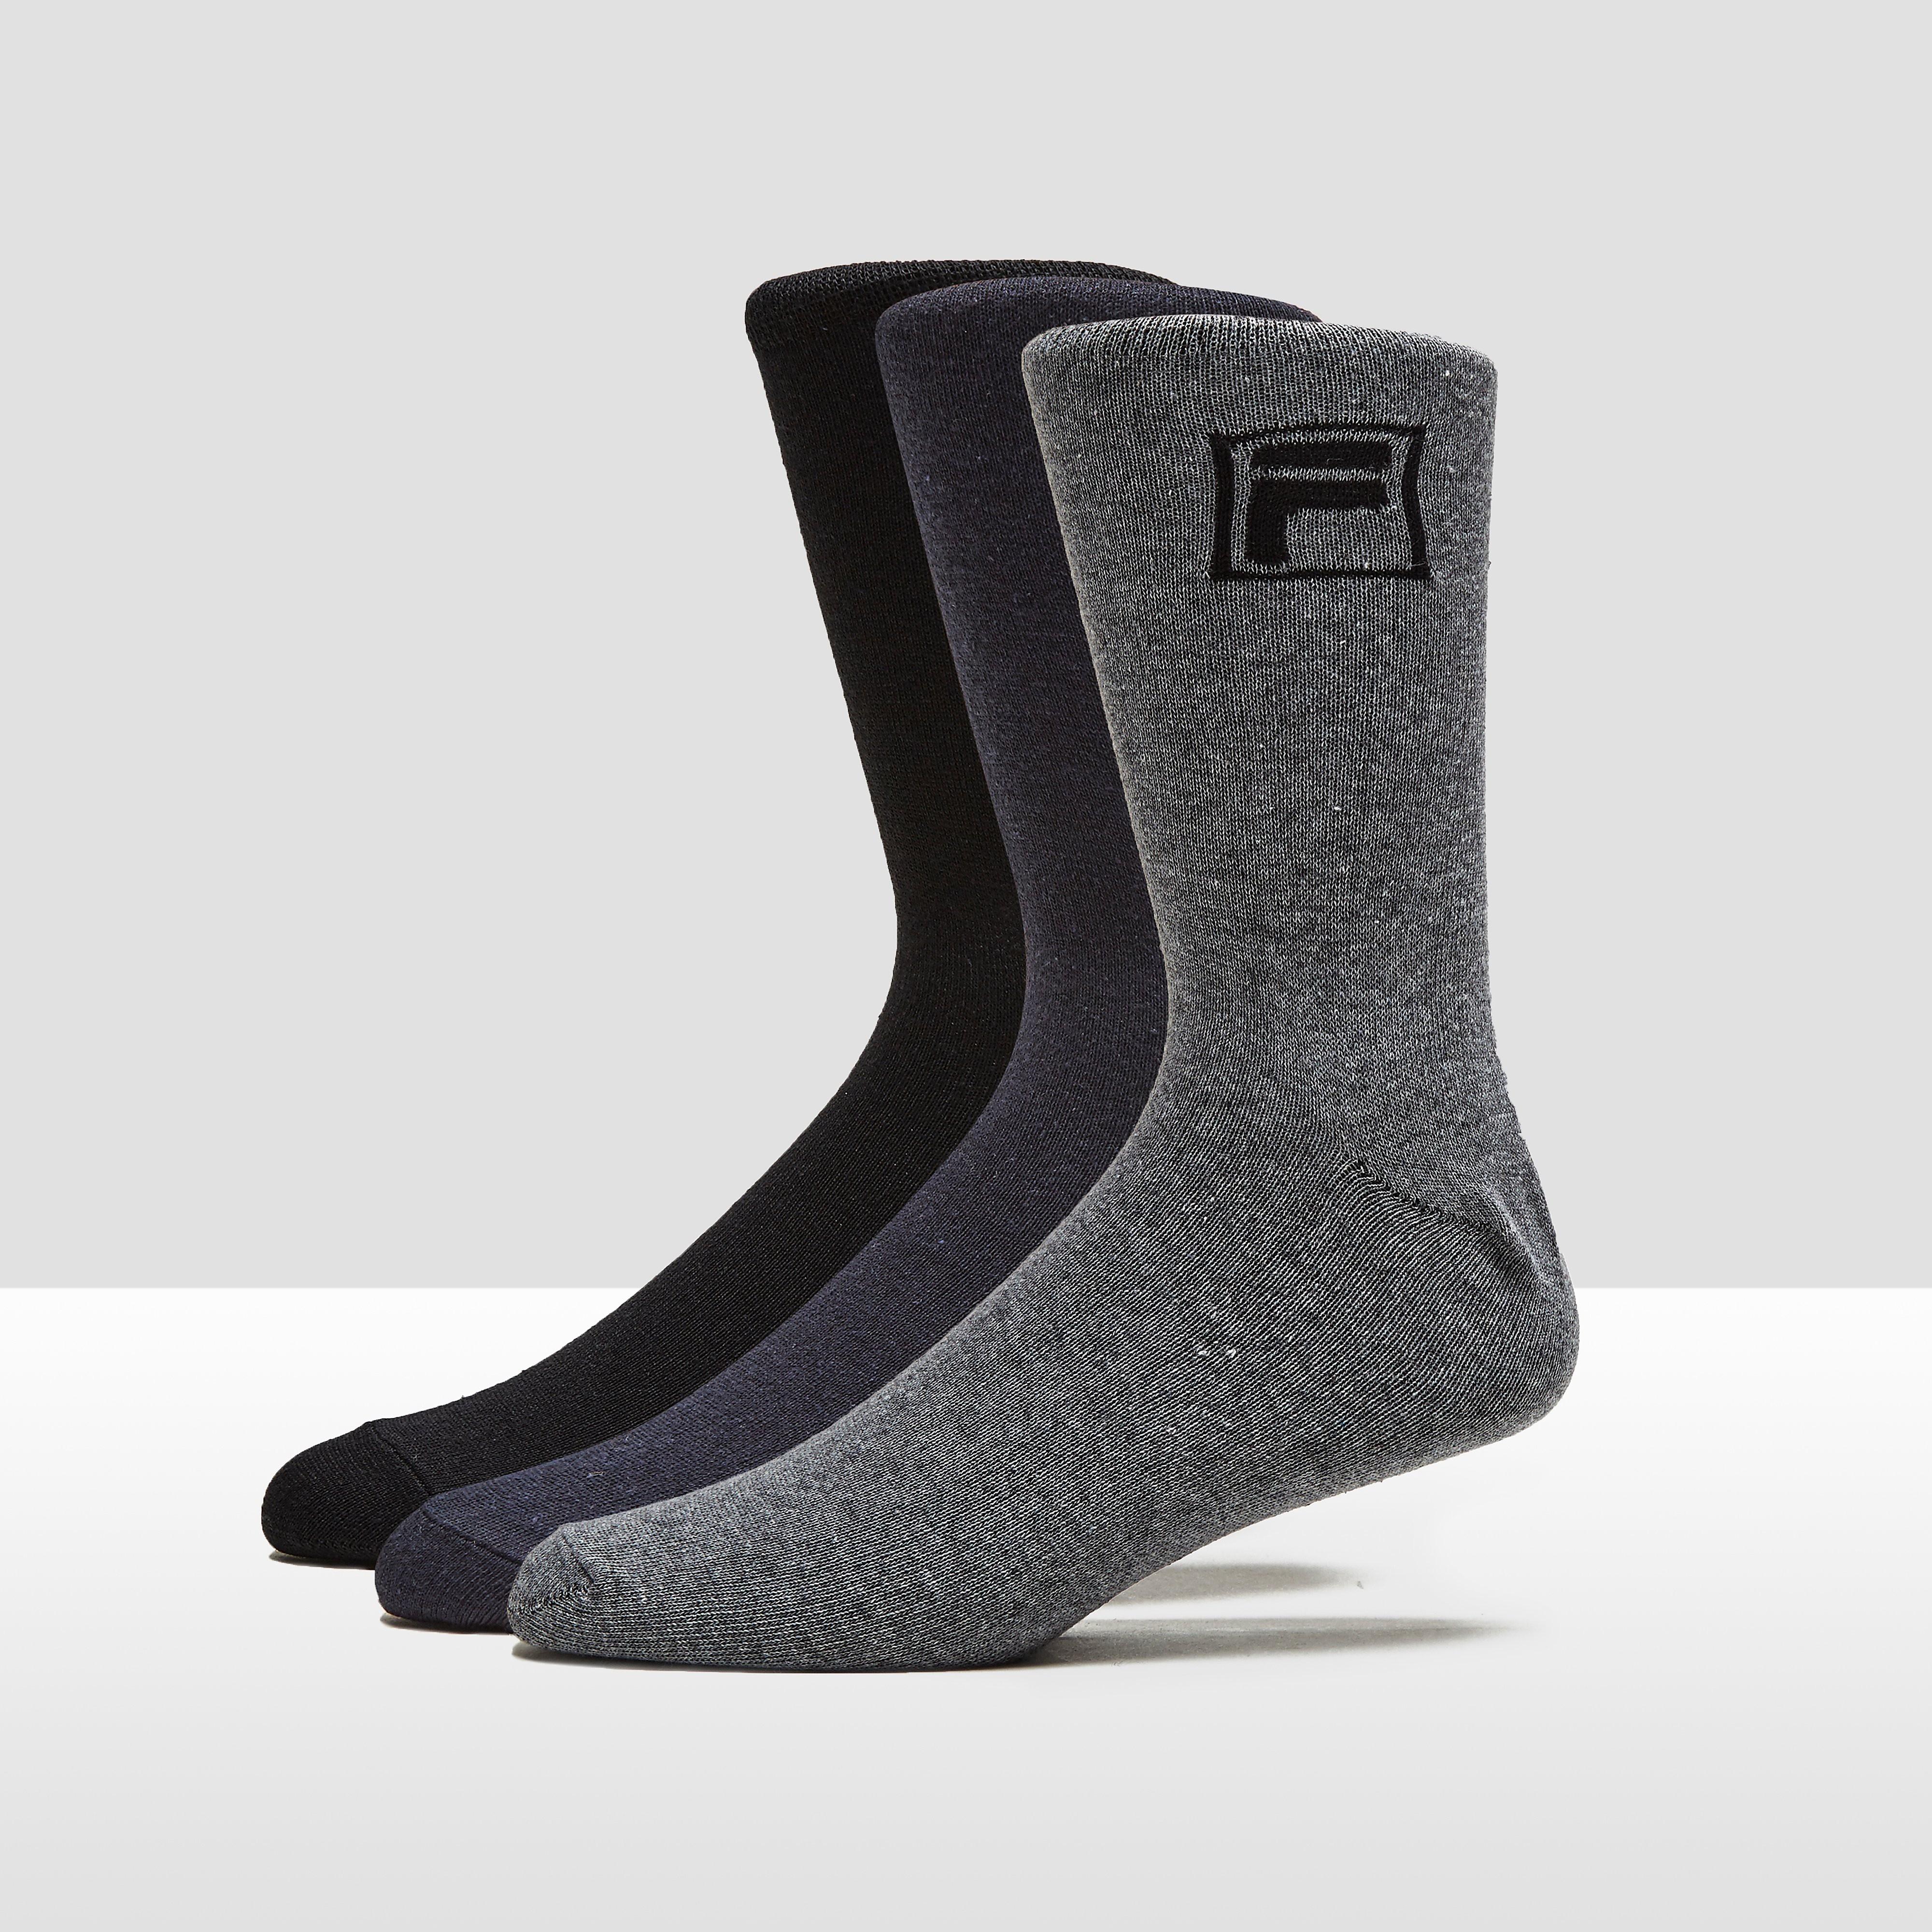 FILA ESSENTIAL DRESSED SOKKEN 3-PACK GRIJS/ZWART